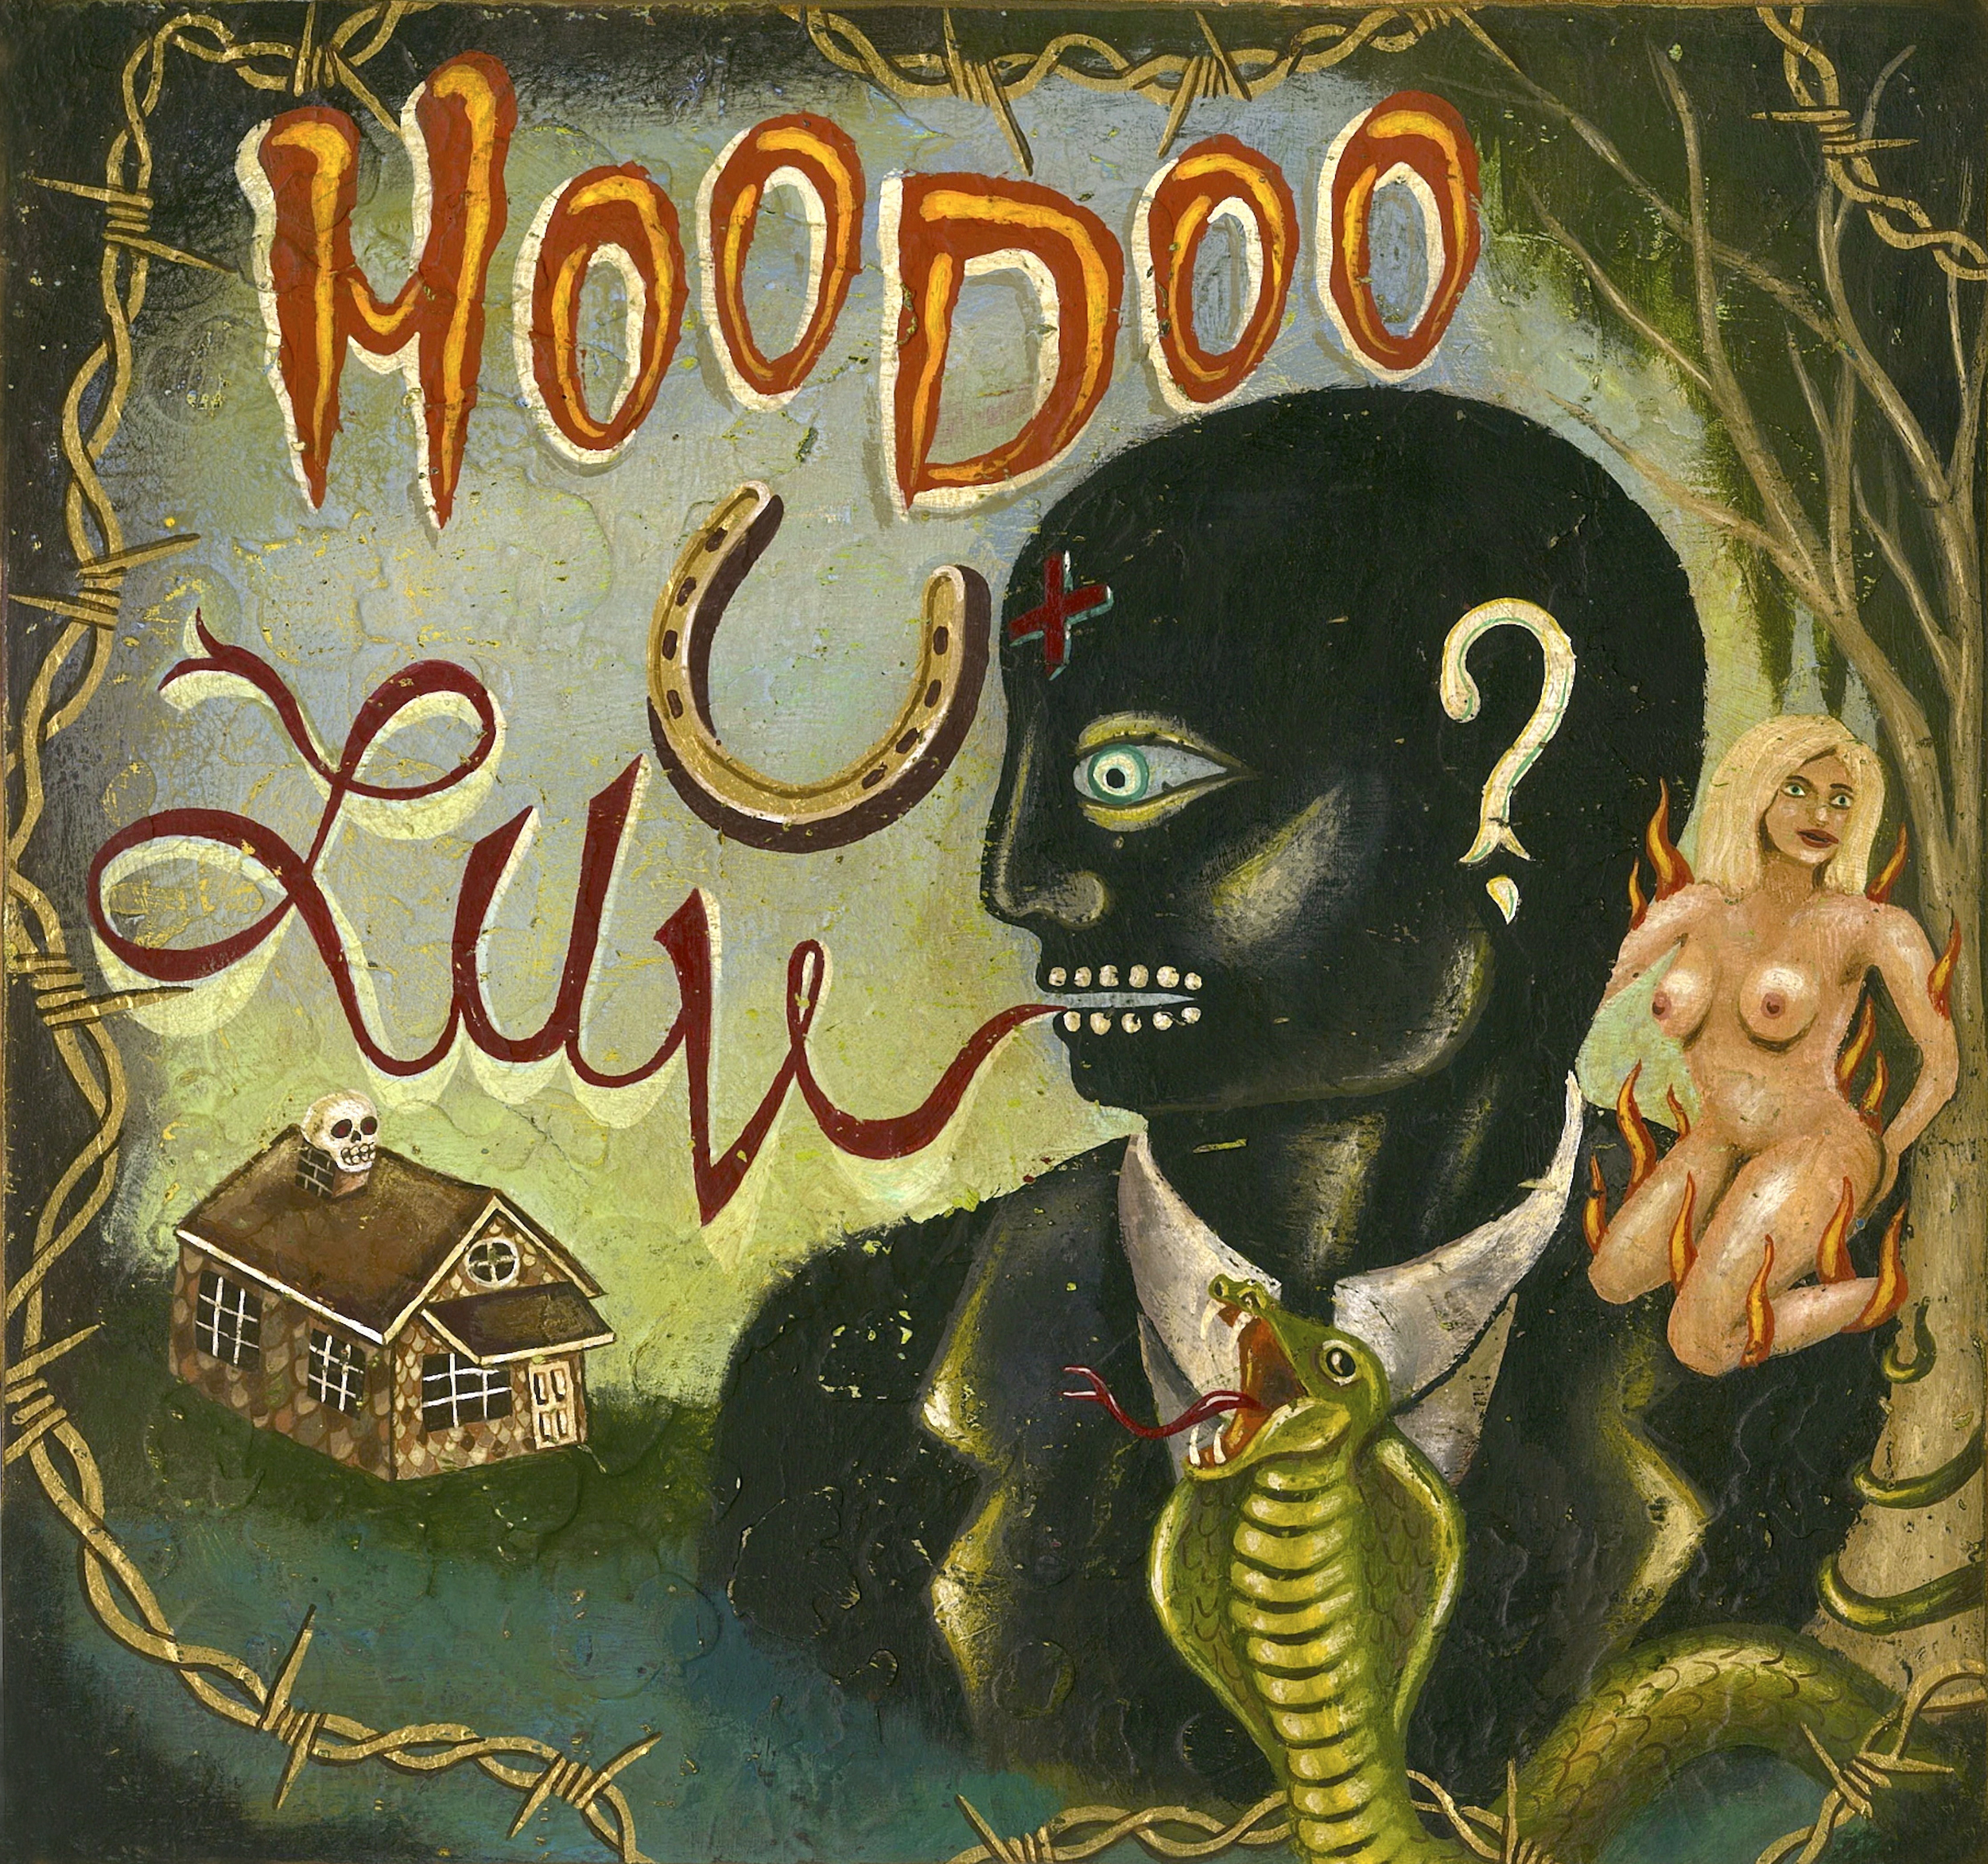 hoodoo you love